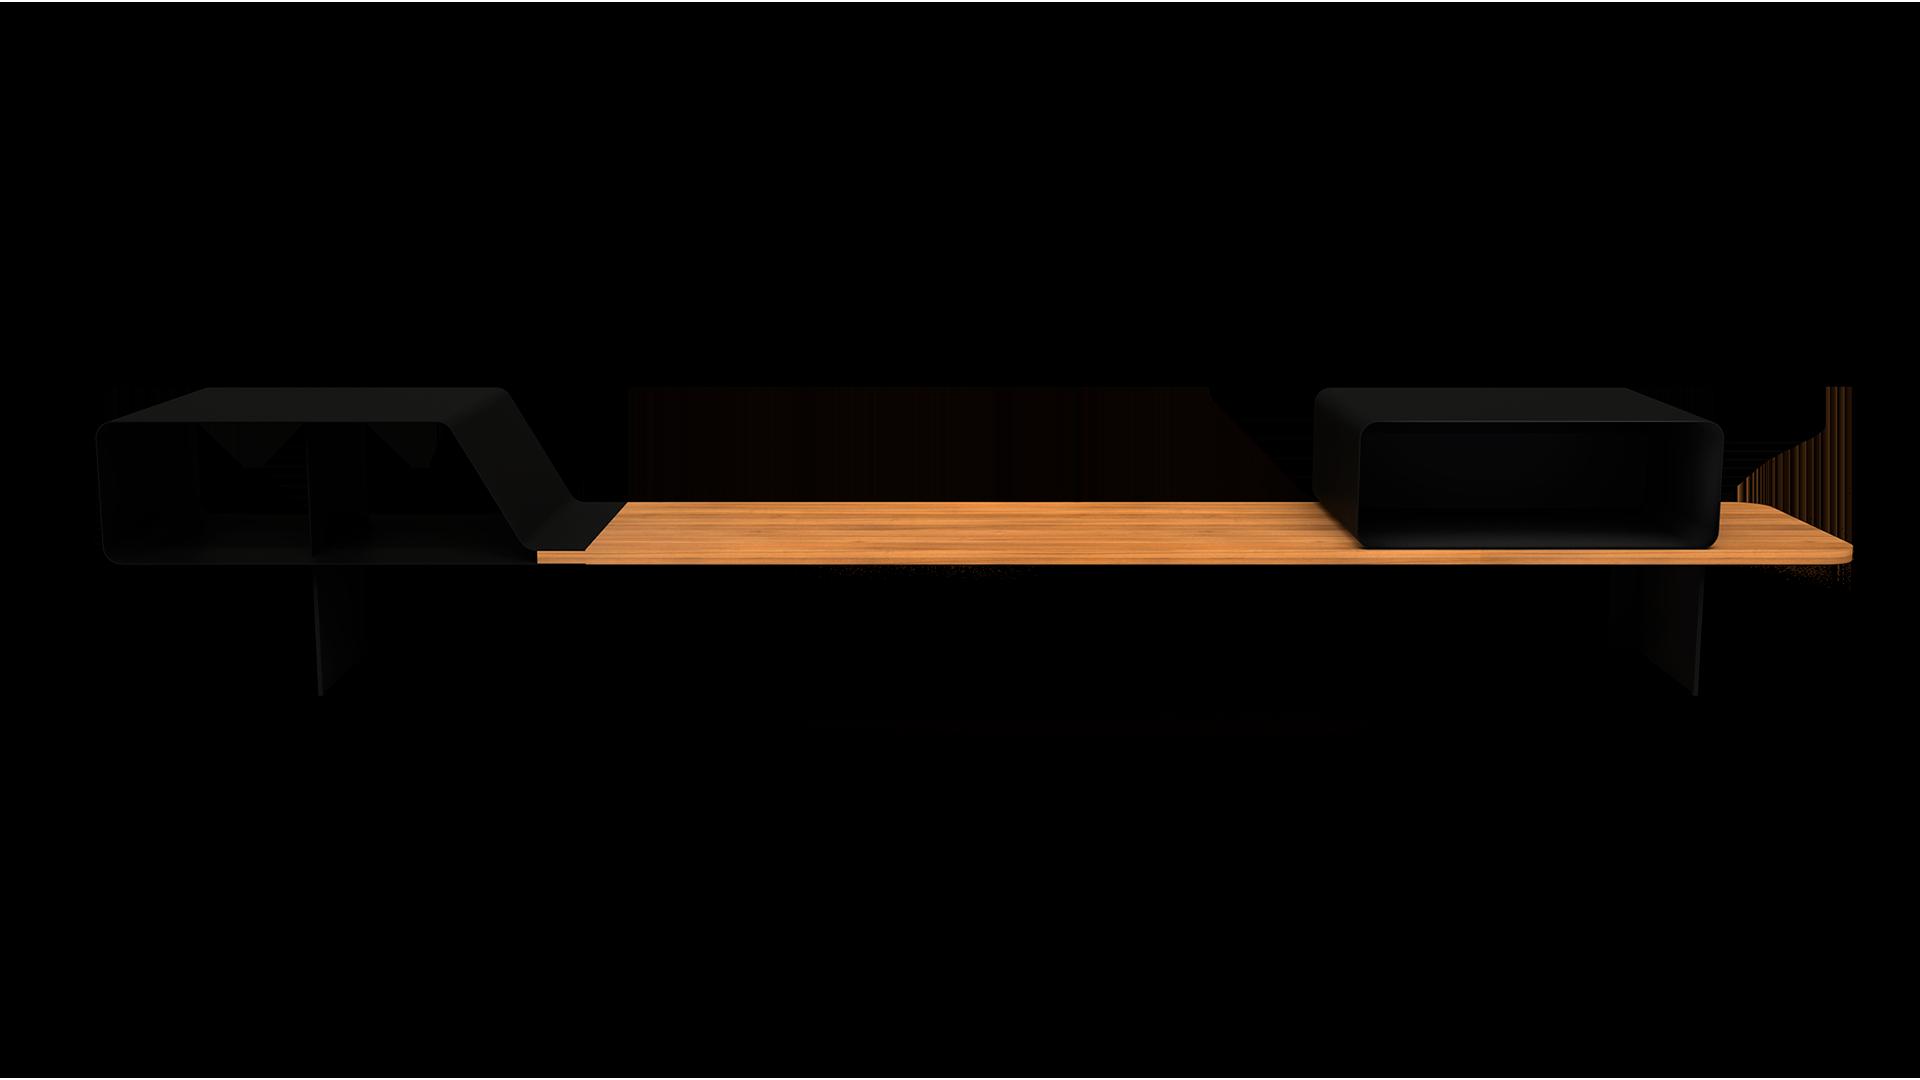 Mueble AGV vista frontal